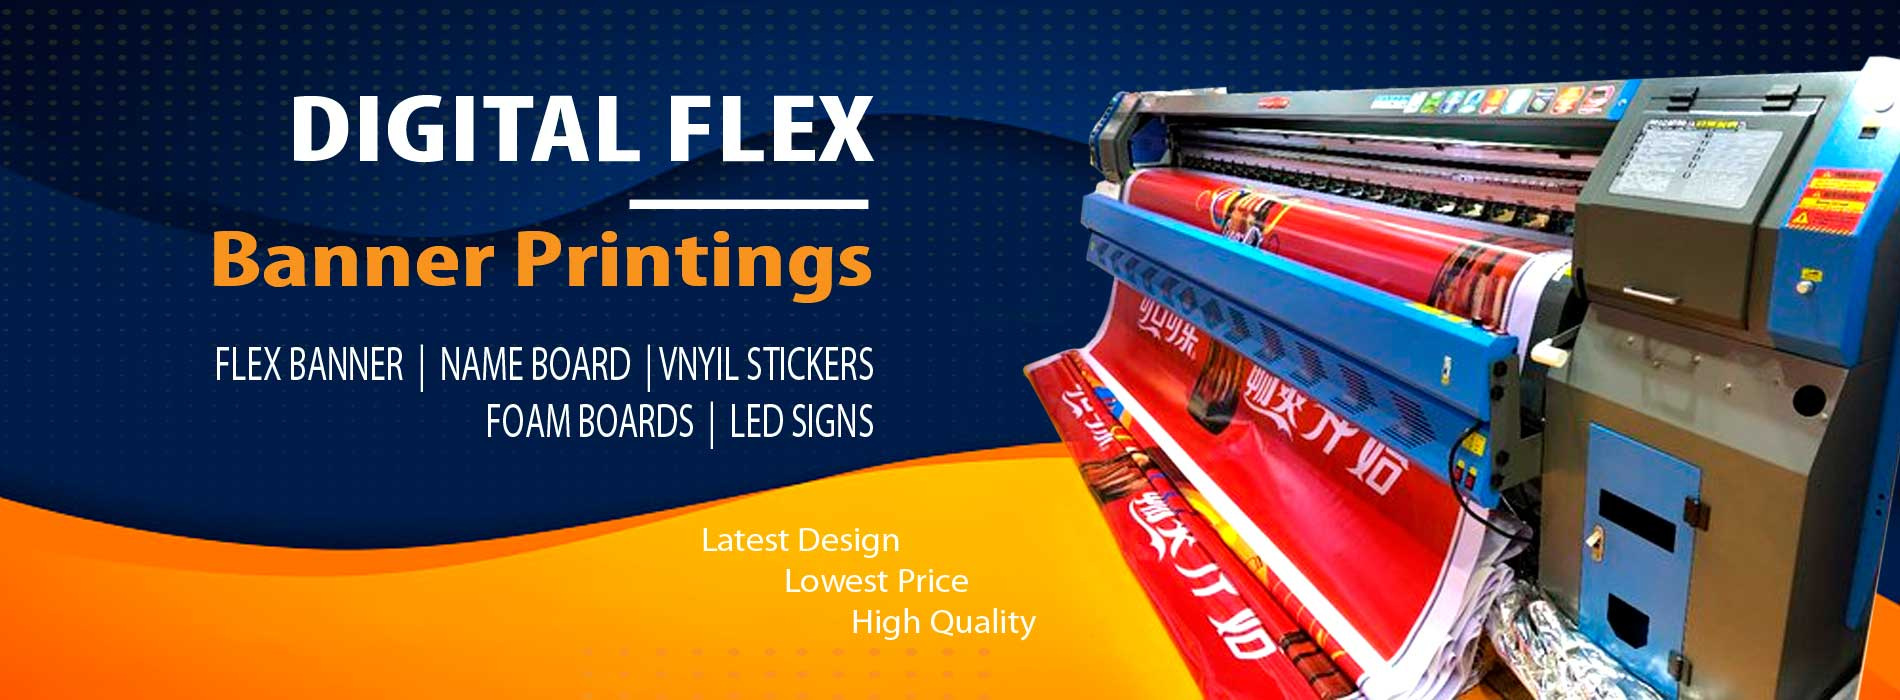 3 Digital Flex Banner Printing